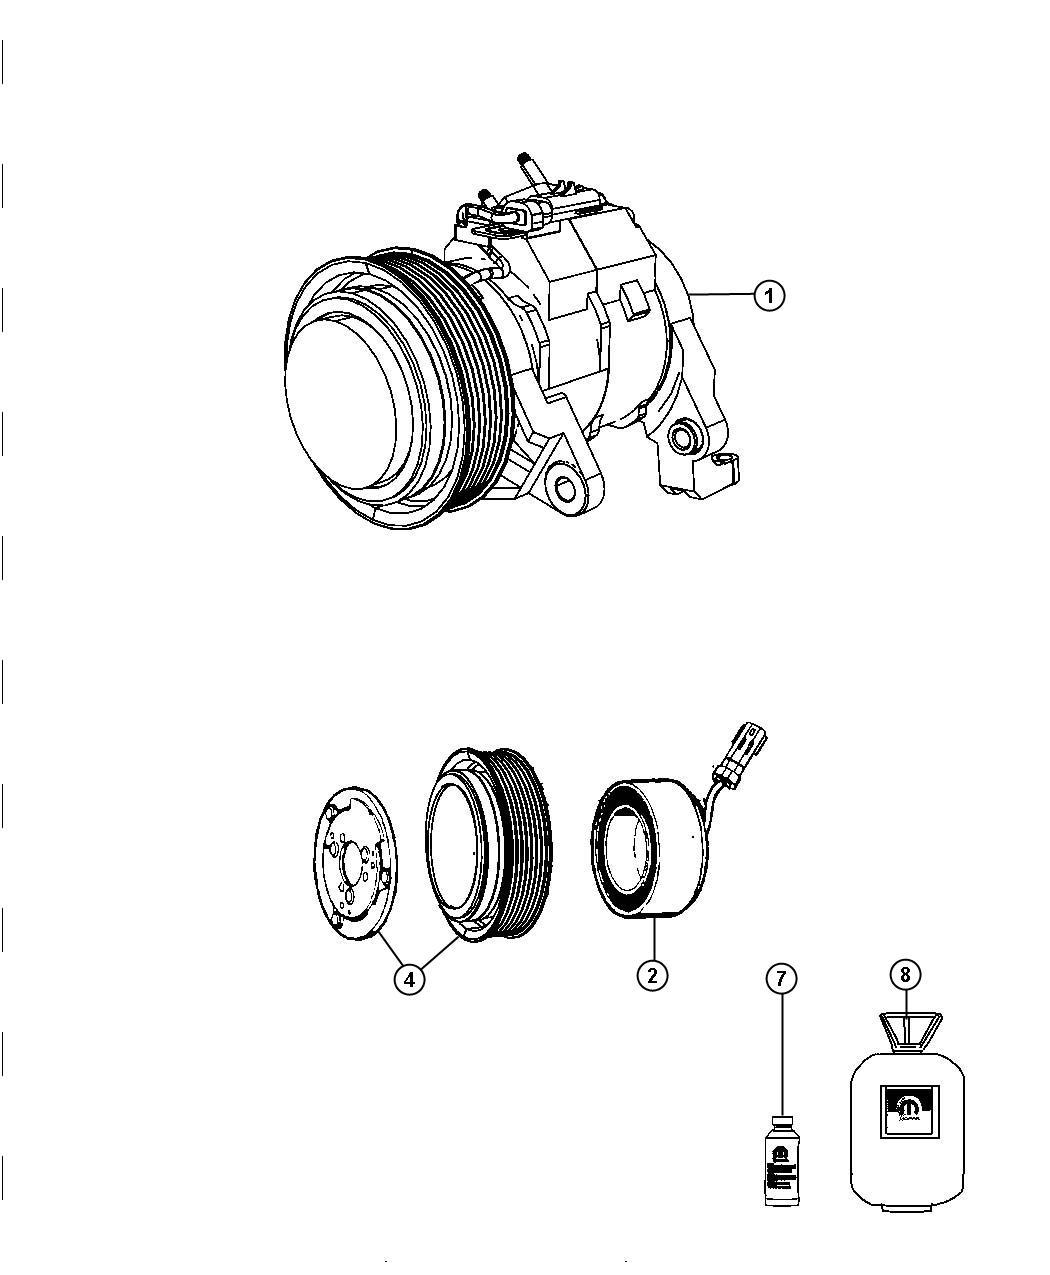 Dodge Ram Compressor Air Conditioning